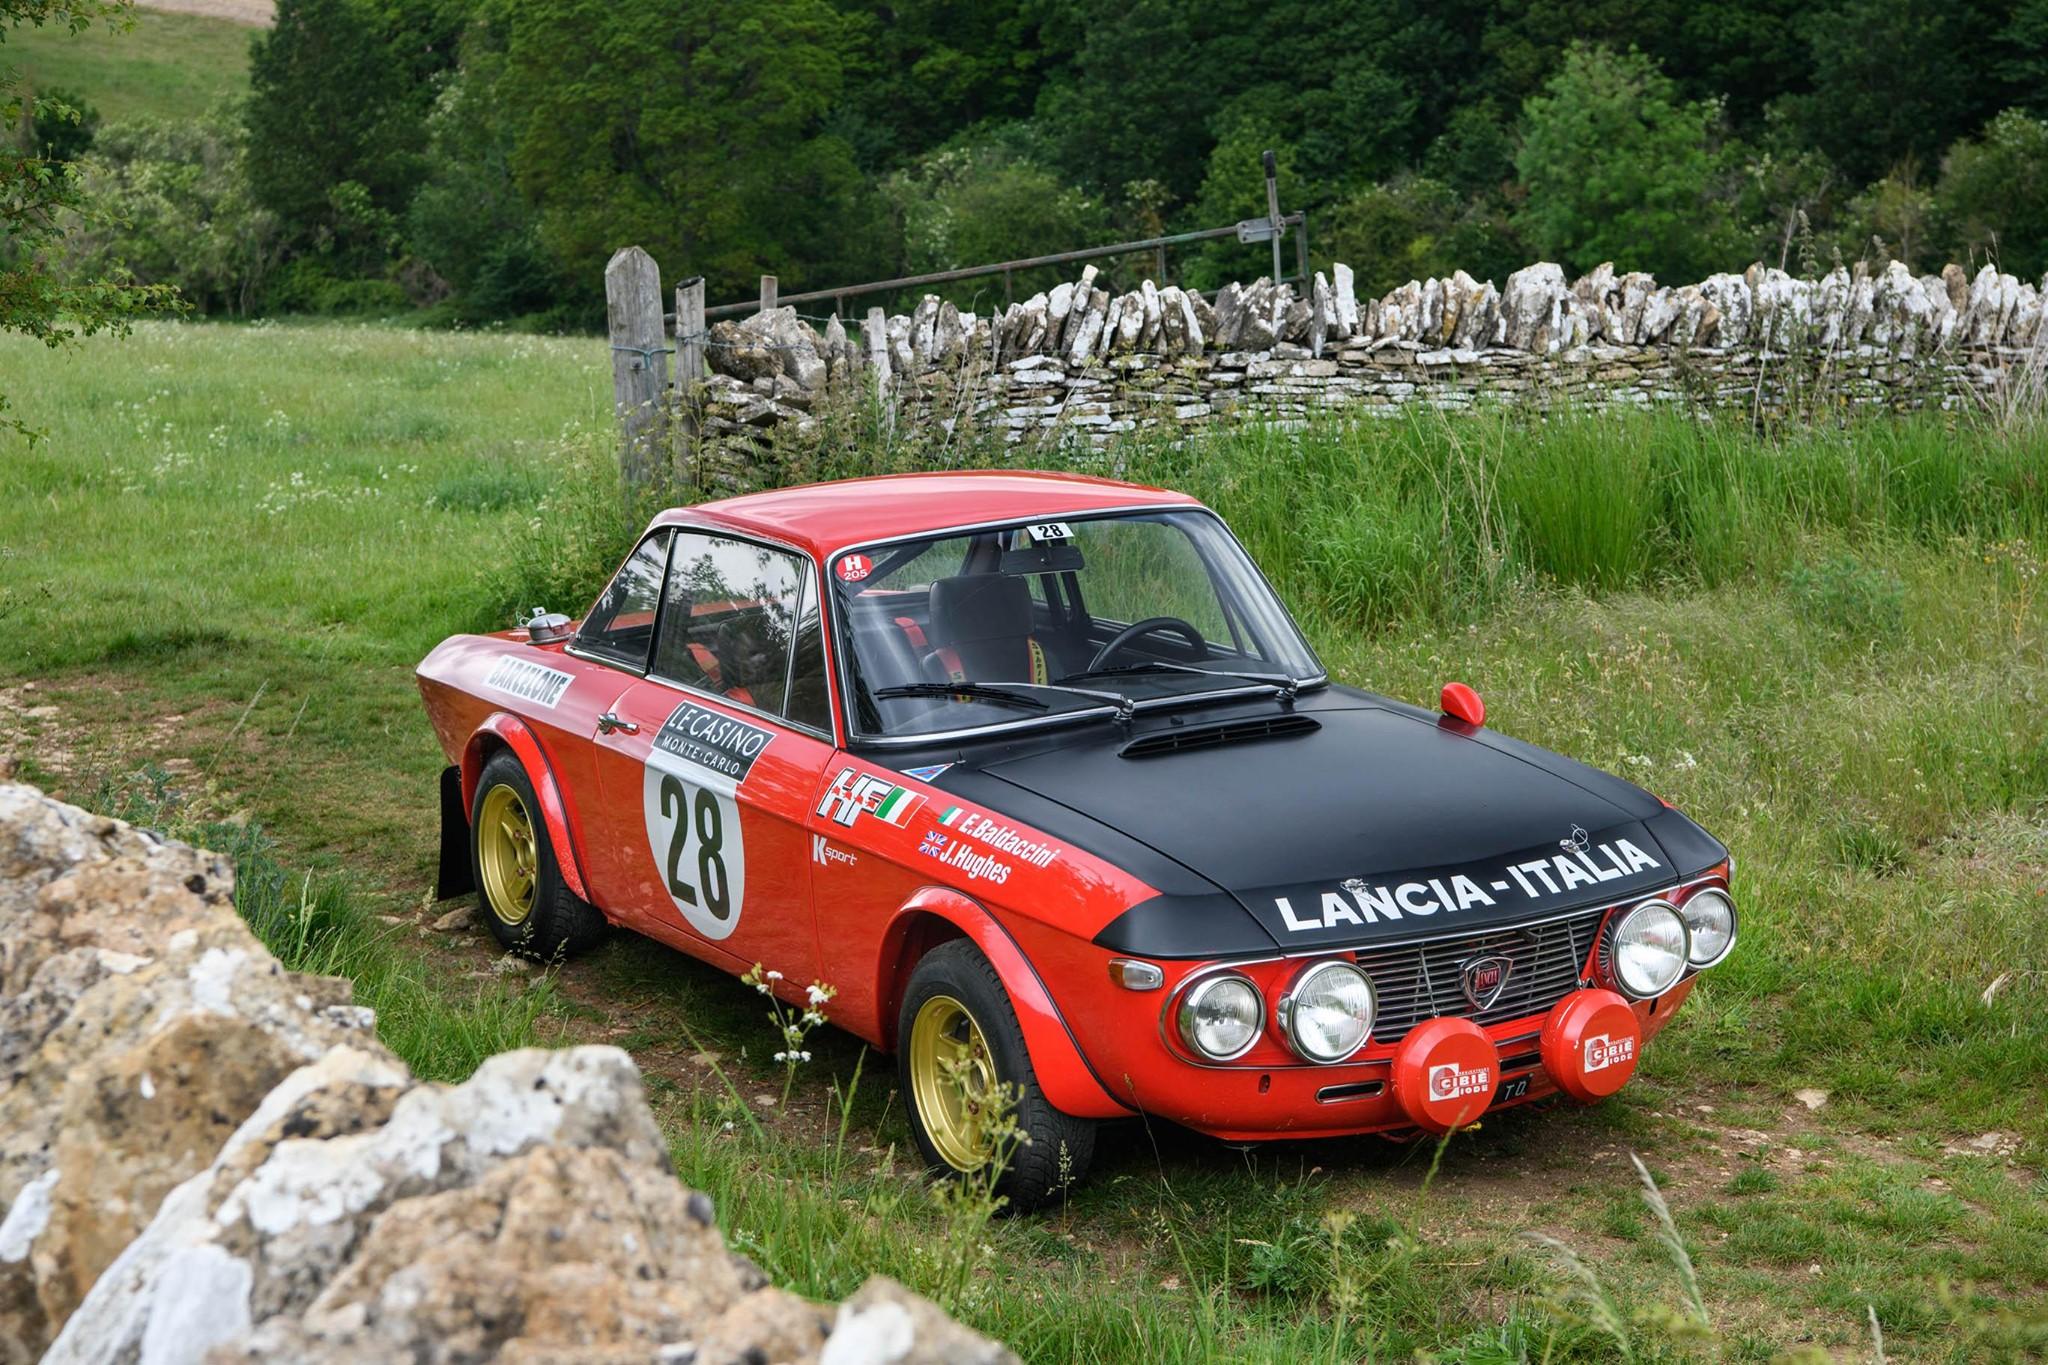 Lancia-Fulvia-Coupe-Rallye-1.6-HF-Fanalone-1